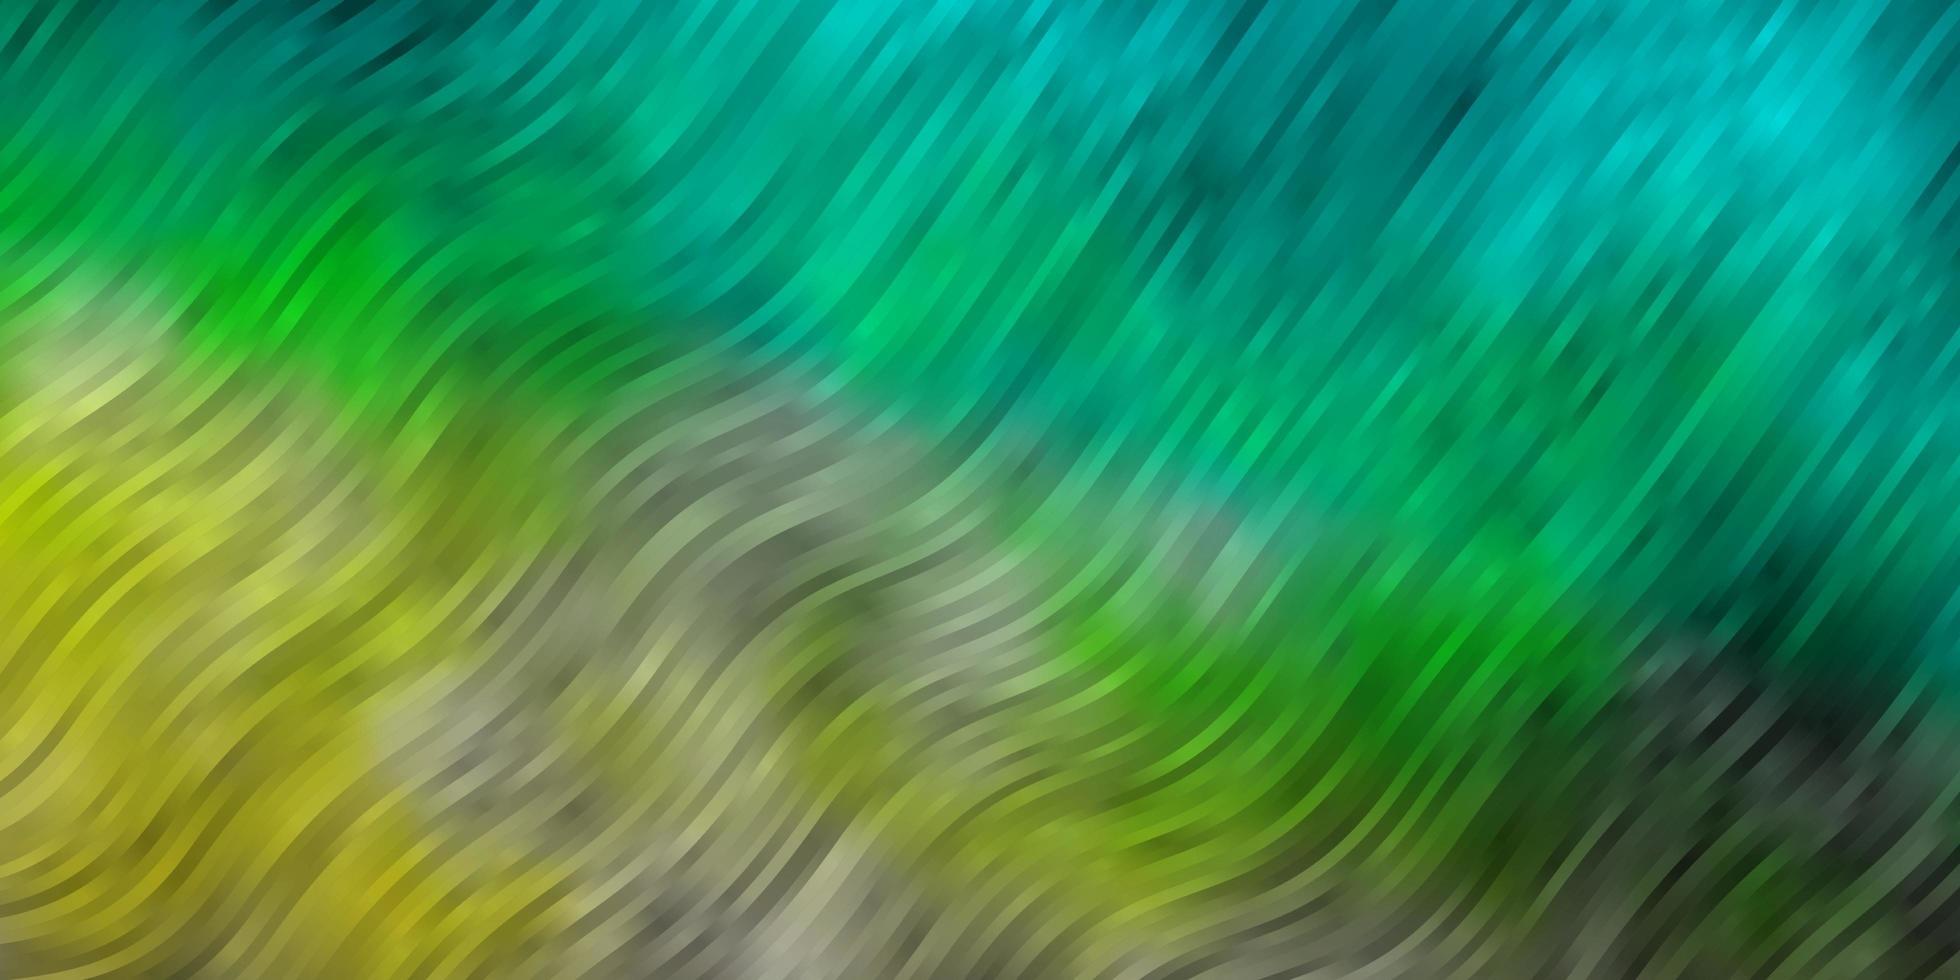 fond de vecteur bleu clair, vert avec des arcs.